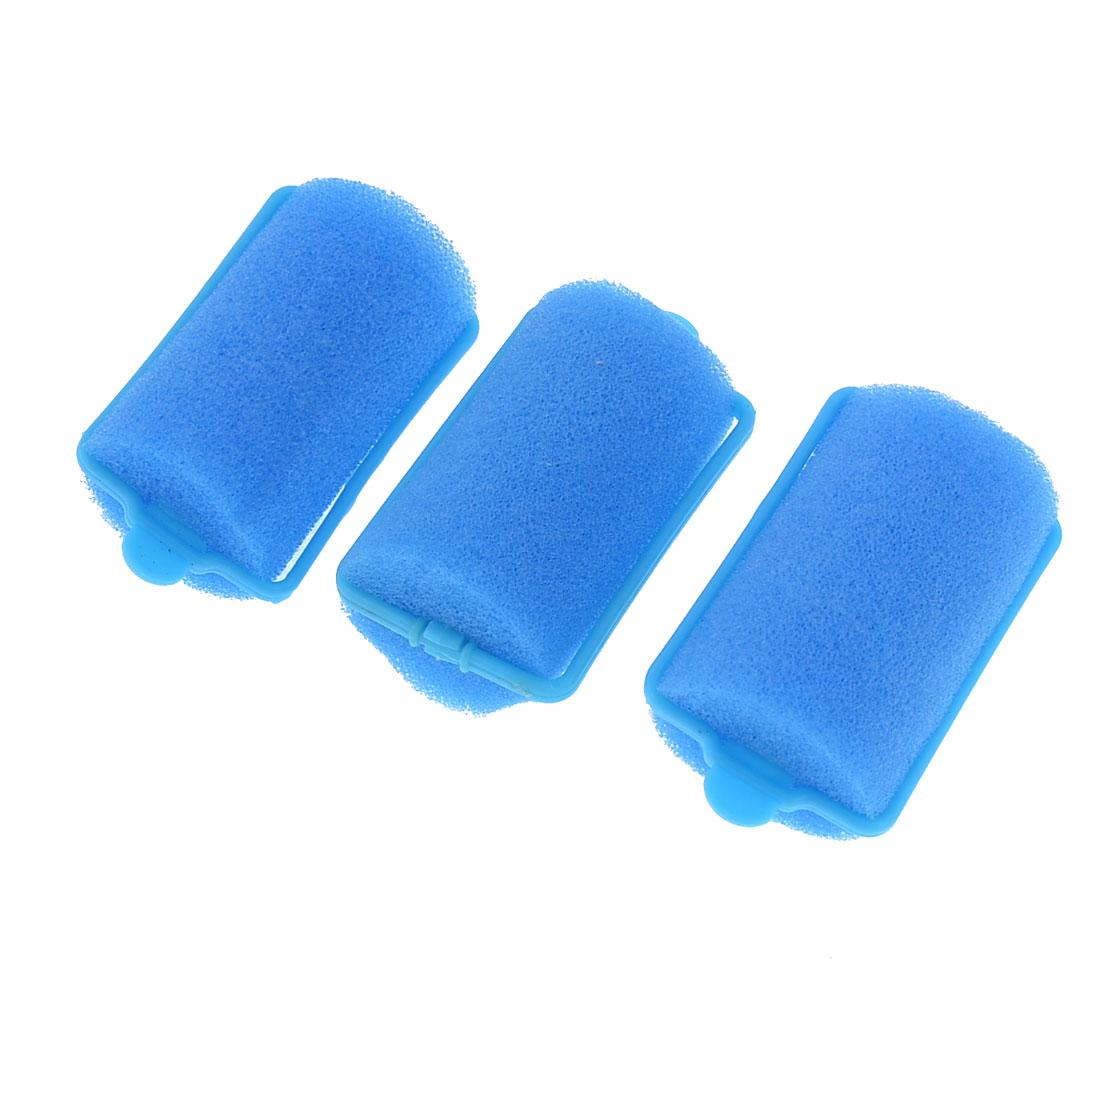 Ladies Blue Spong Curlers Beauty Tools Hair Roller 3 Pcs